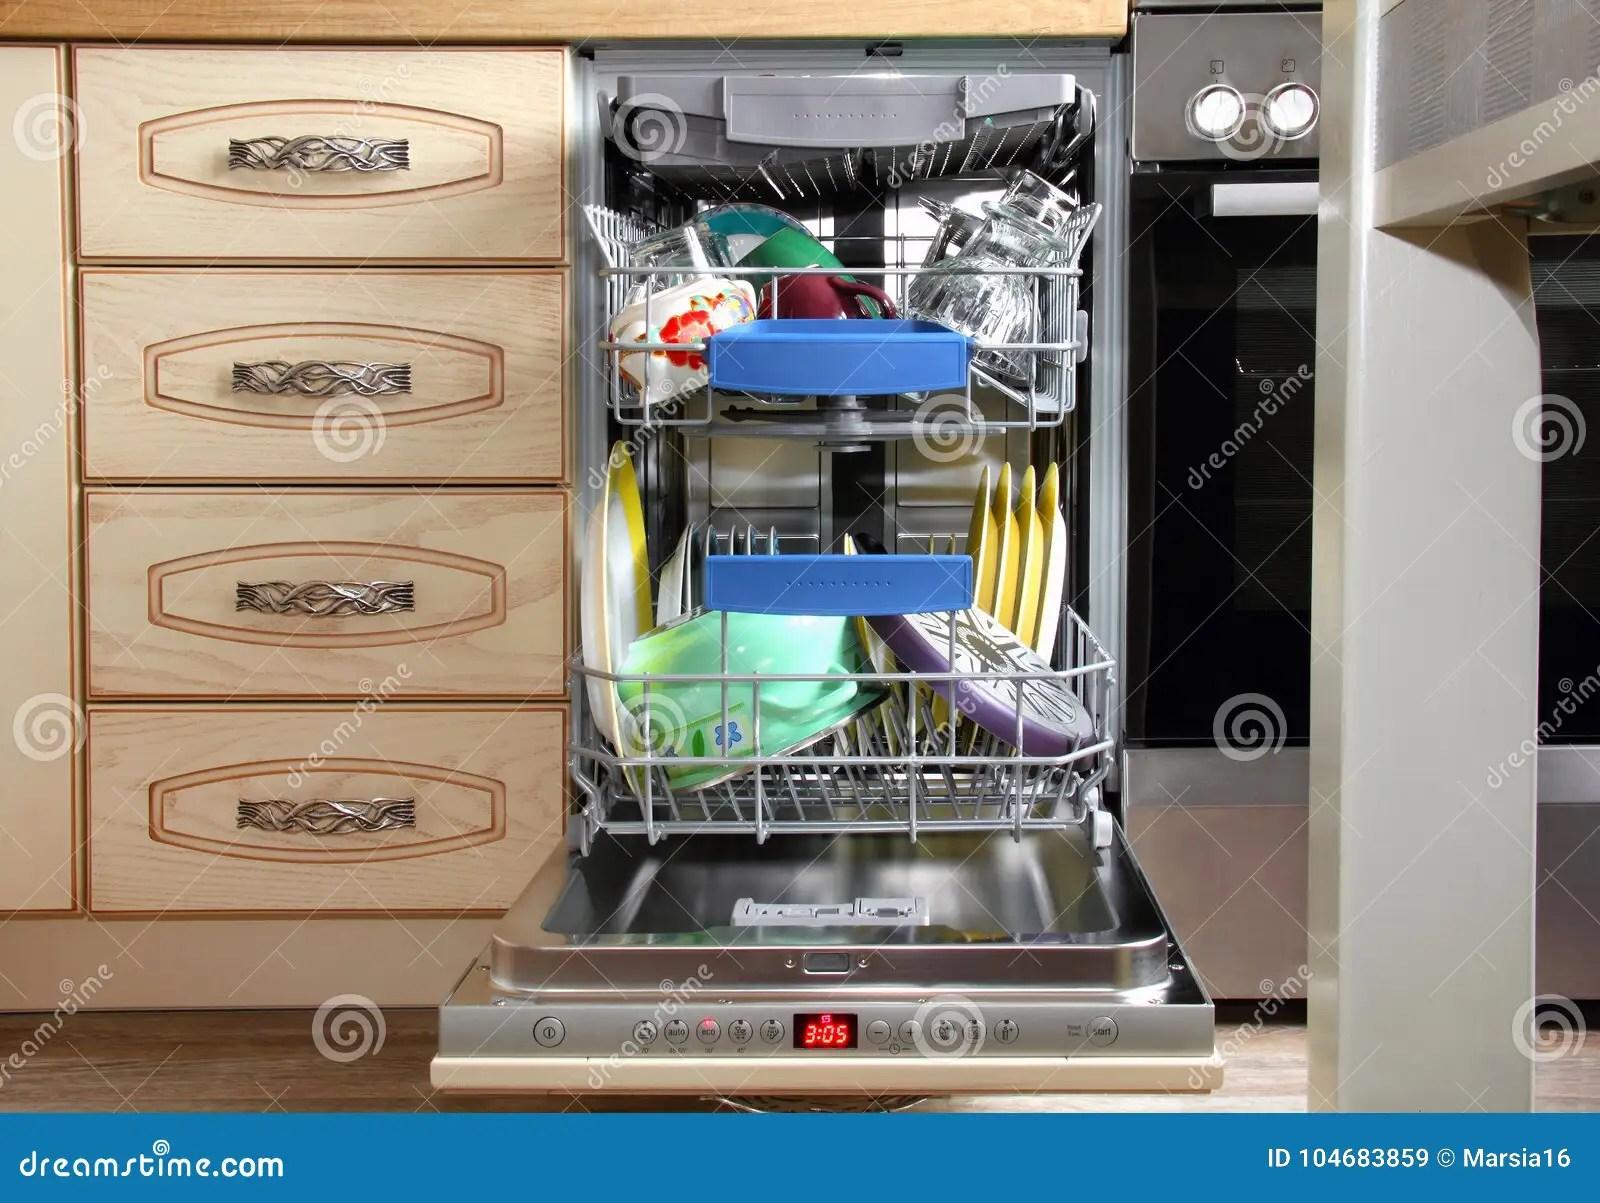 kitchen dishwashers industrial hoods stainless steel 在内部的厨房洗碗机库存例证 插画包括有刀叉餐具 弯脚的 砂锅 扁平的 在内部的厨房洗碗机